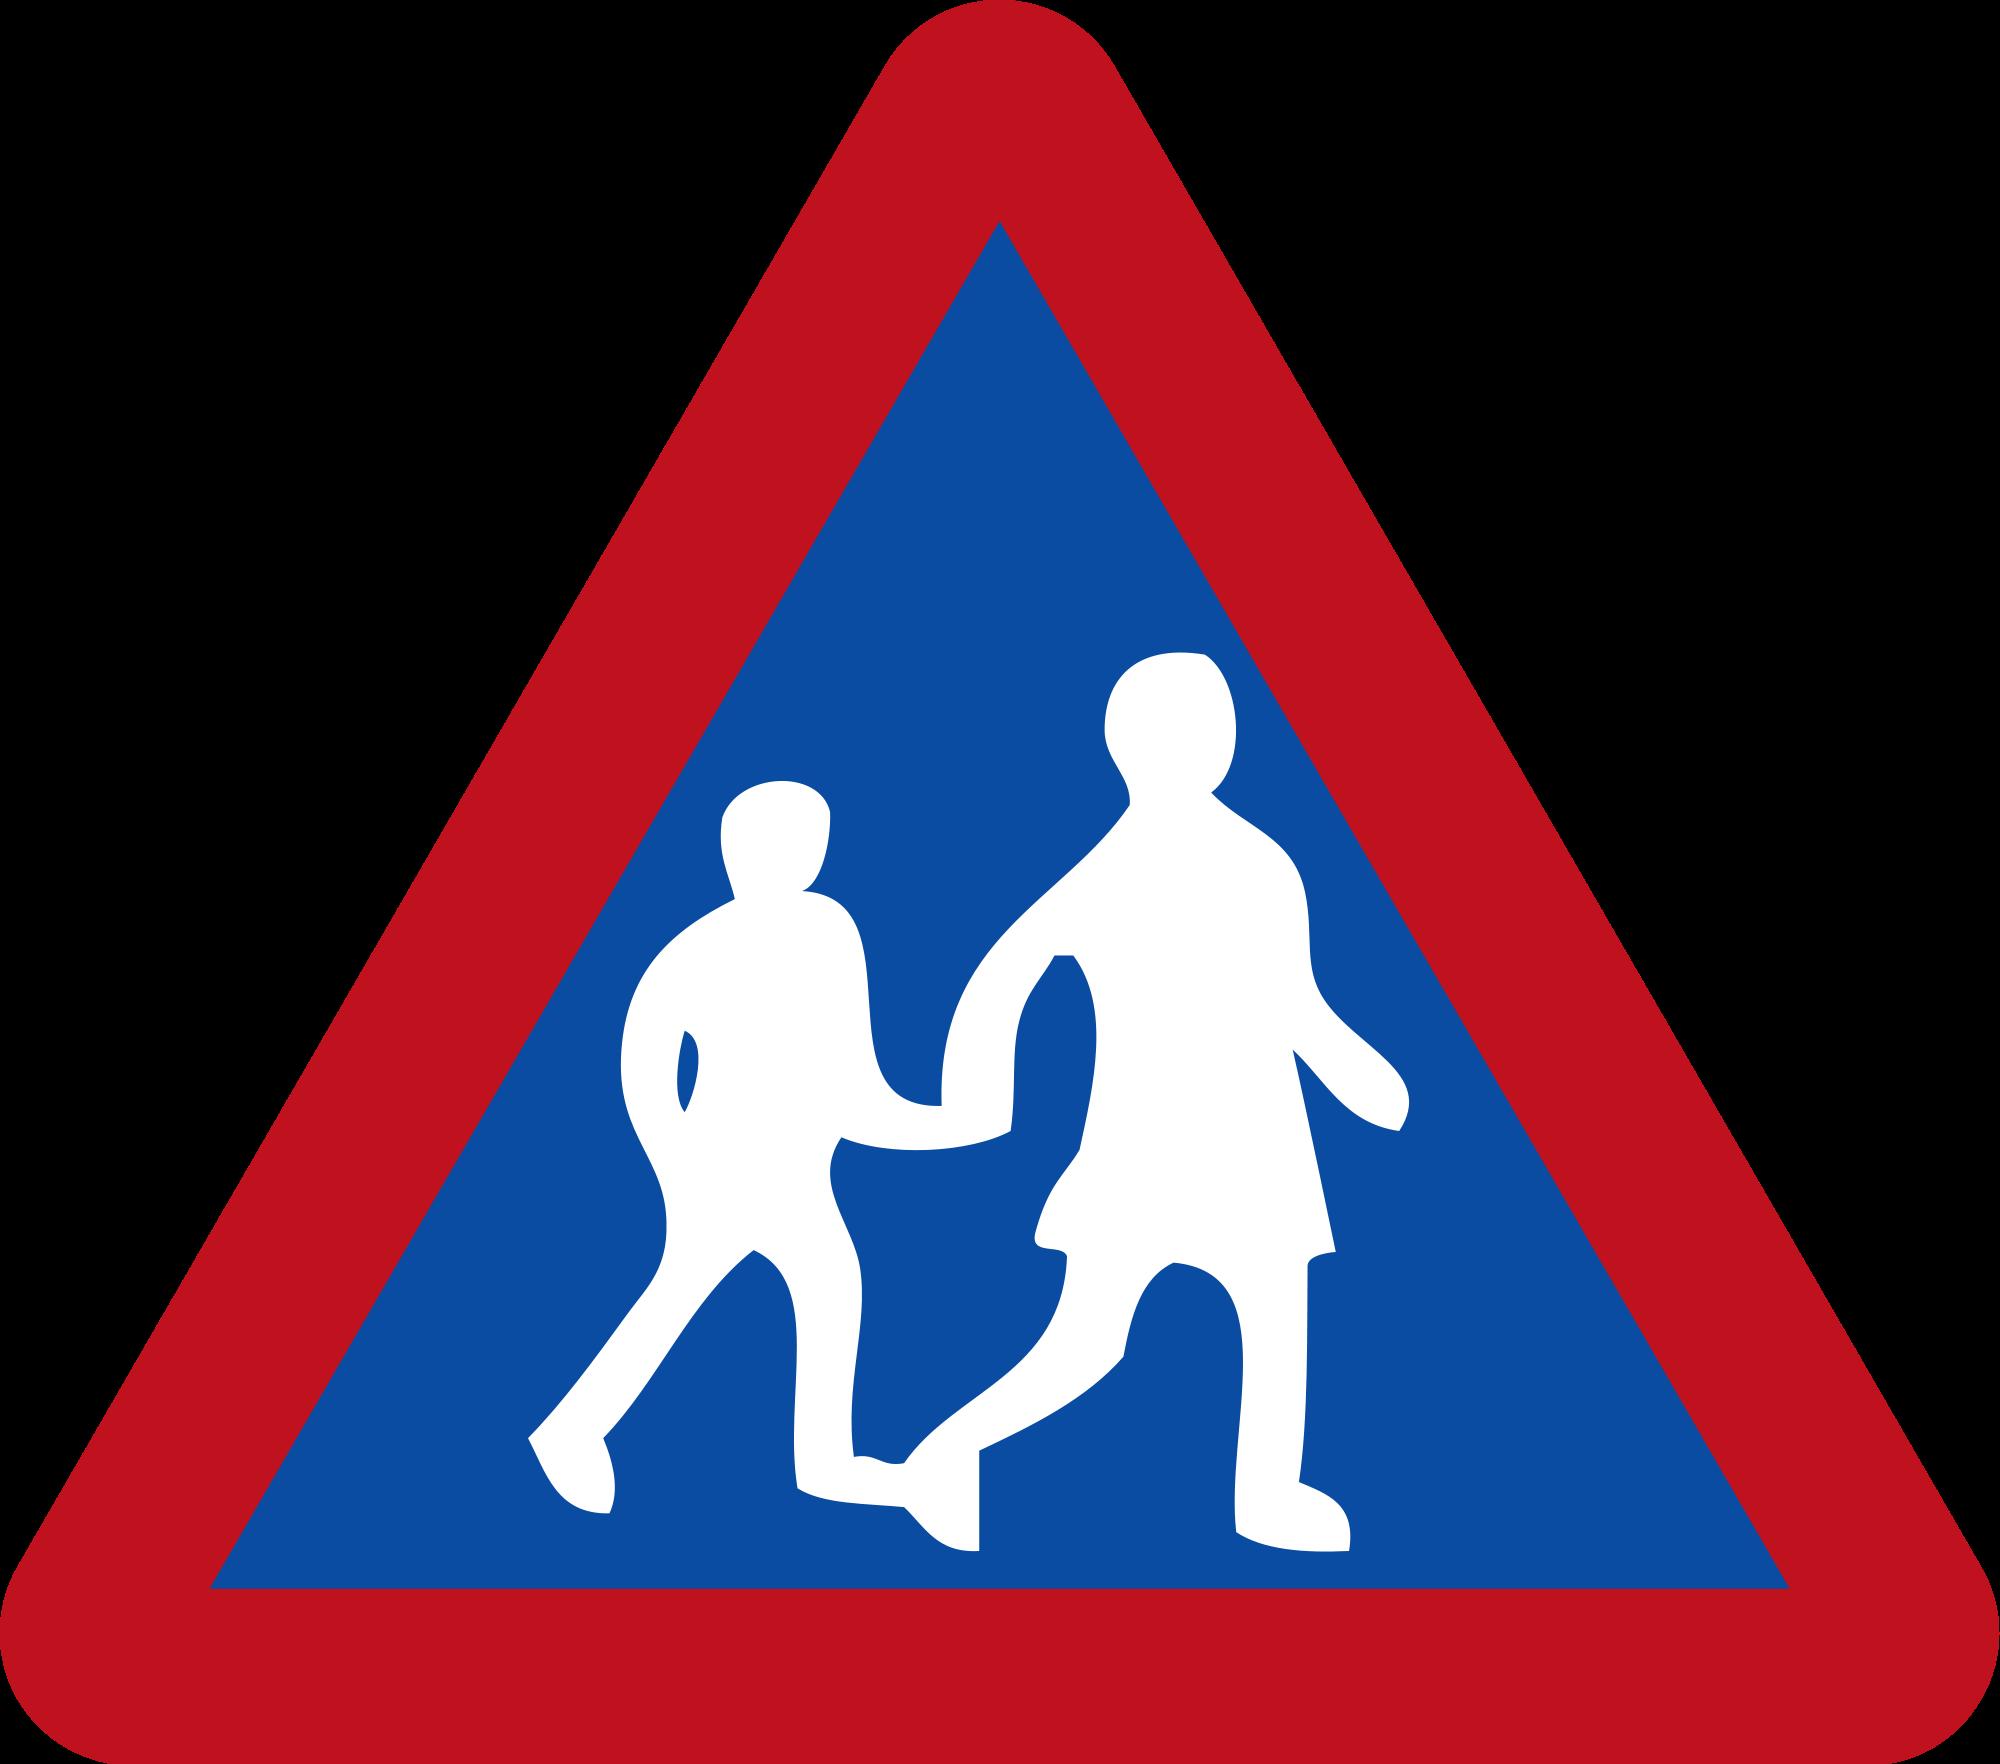 Children crossing sign botswana. Clipart road file